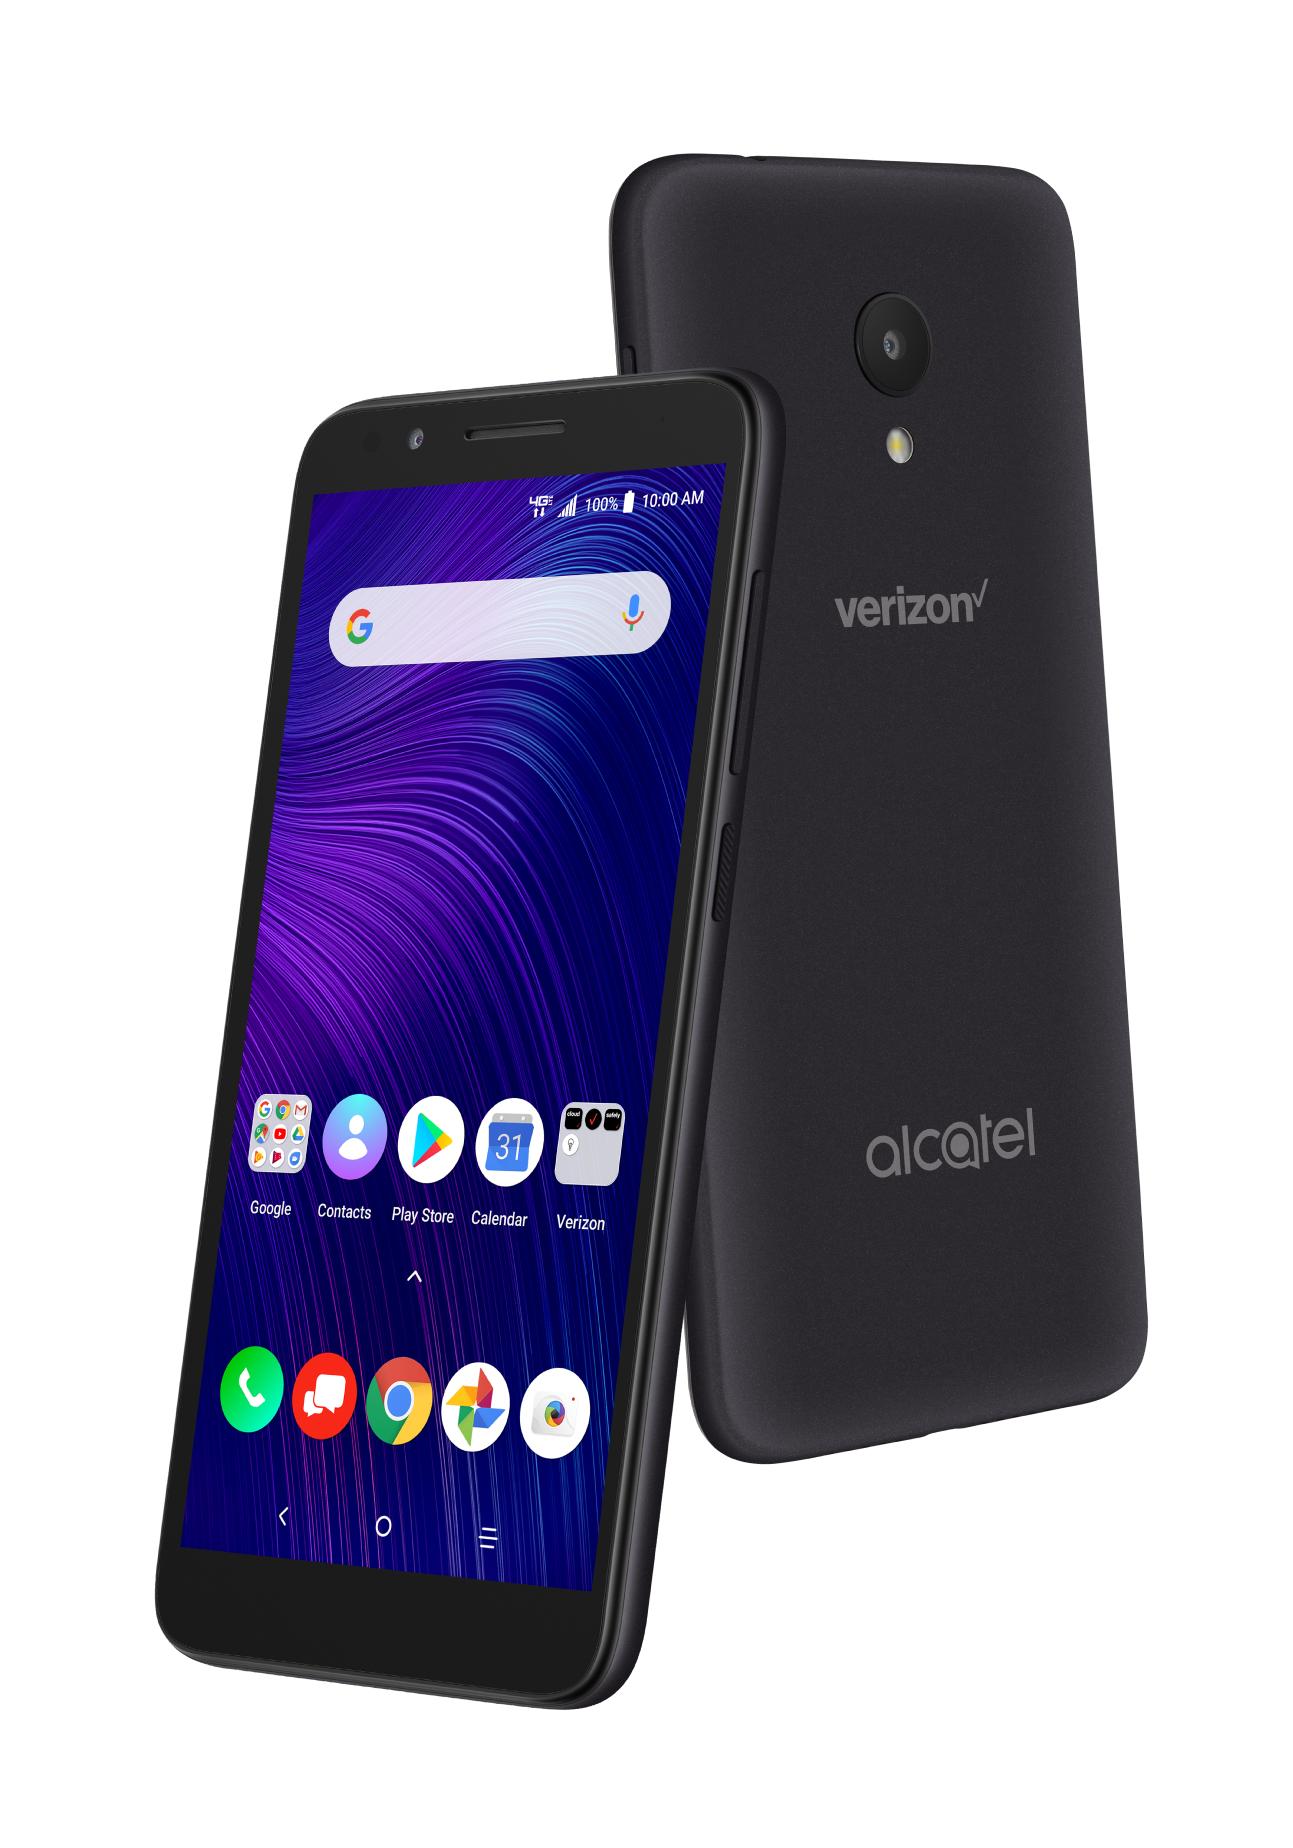 Verizon picks up its first Alcatel phone, the Avalon V